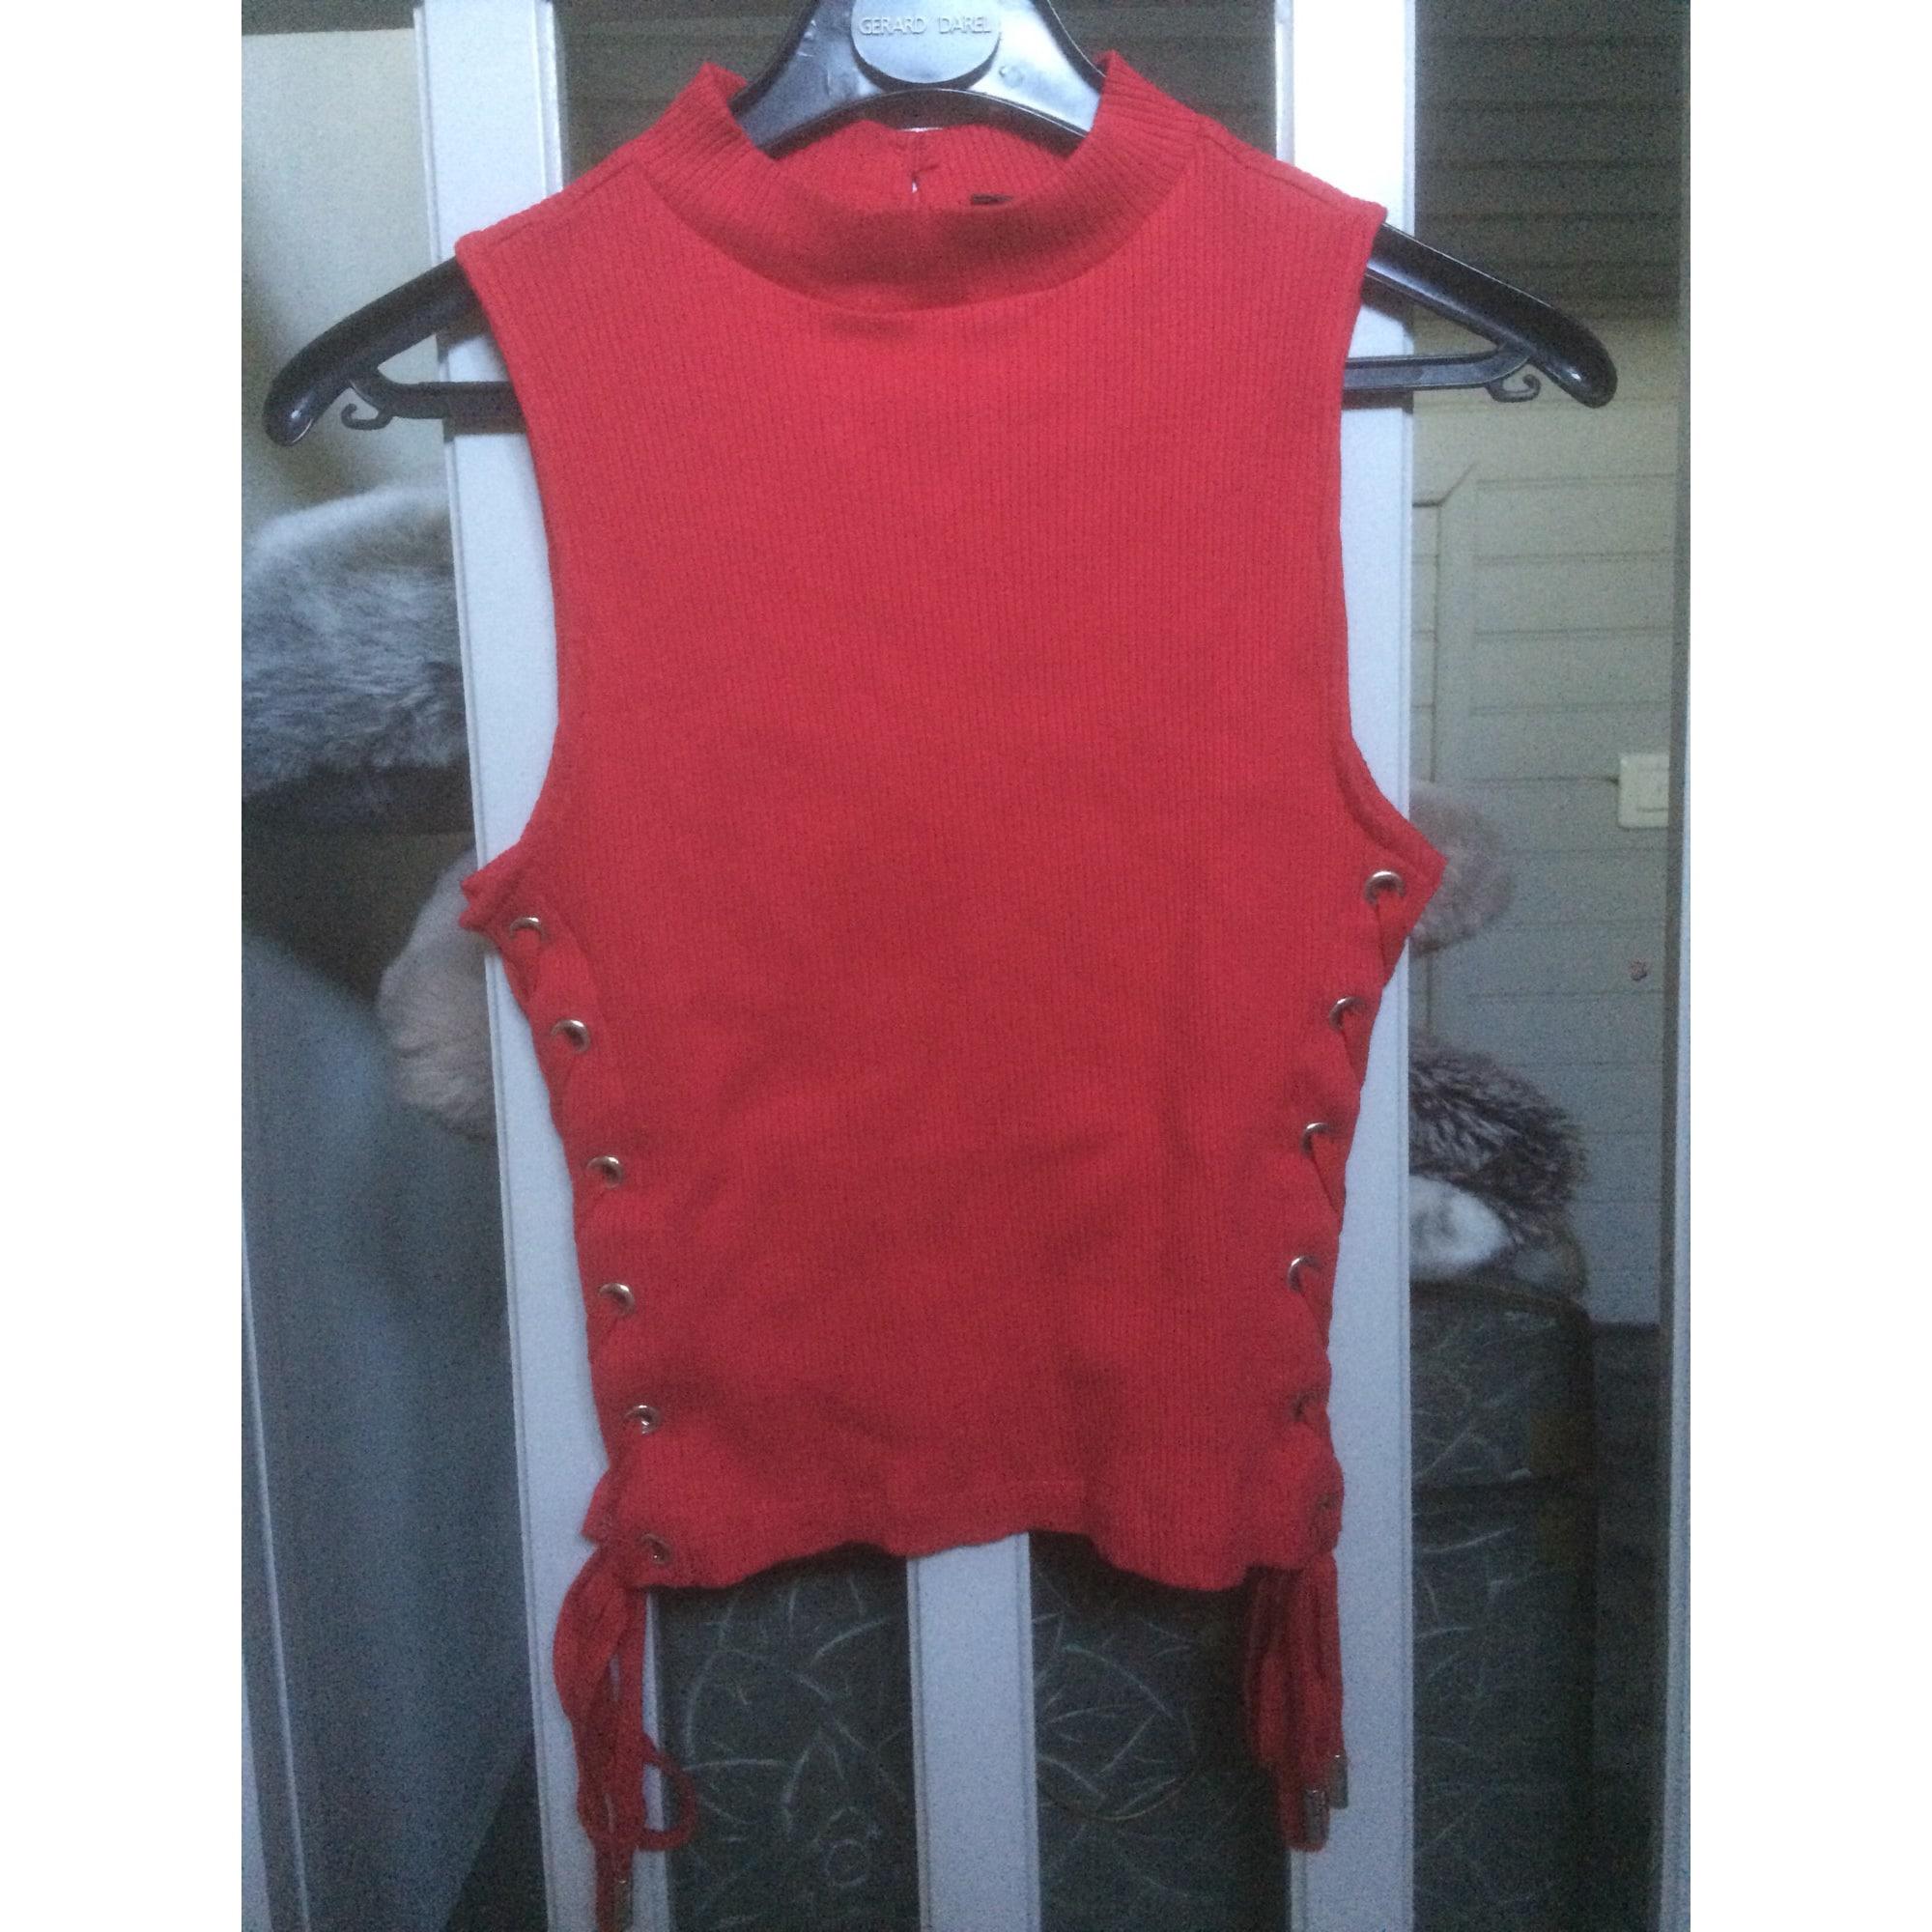 Top, tee-shirt GUESS Rouge, bordeaux